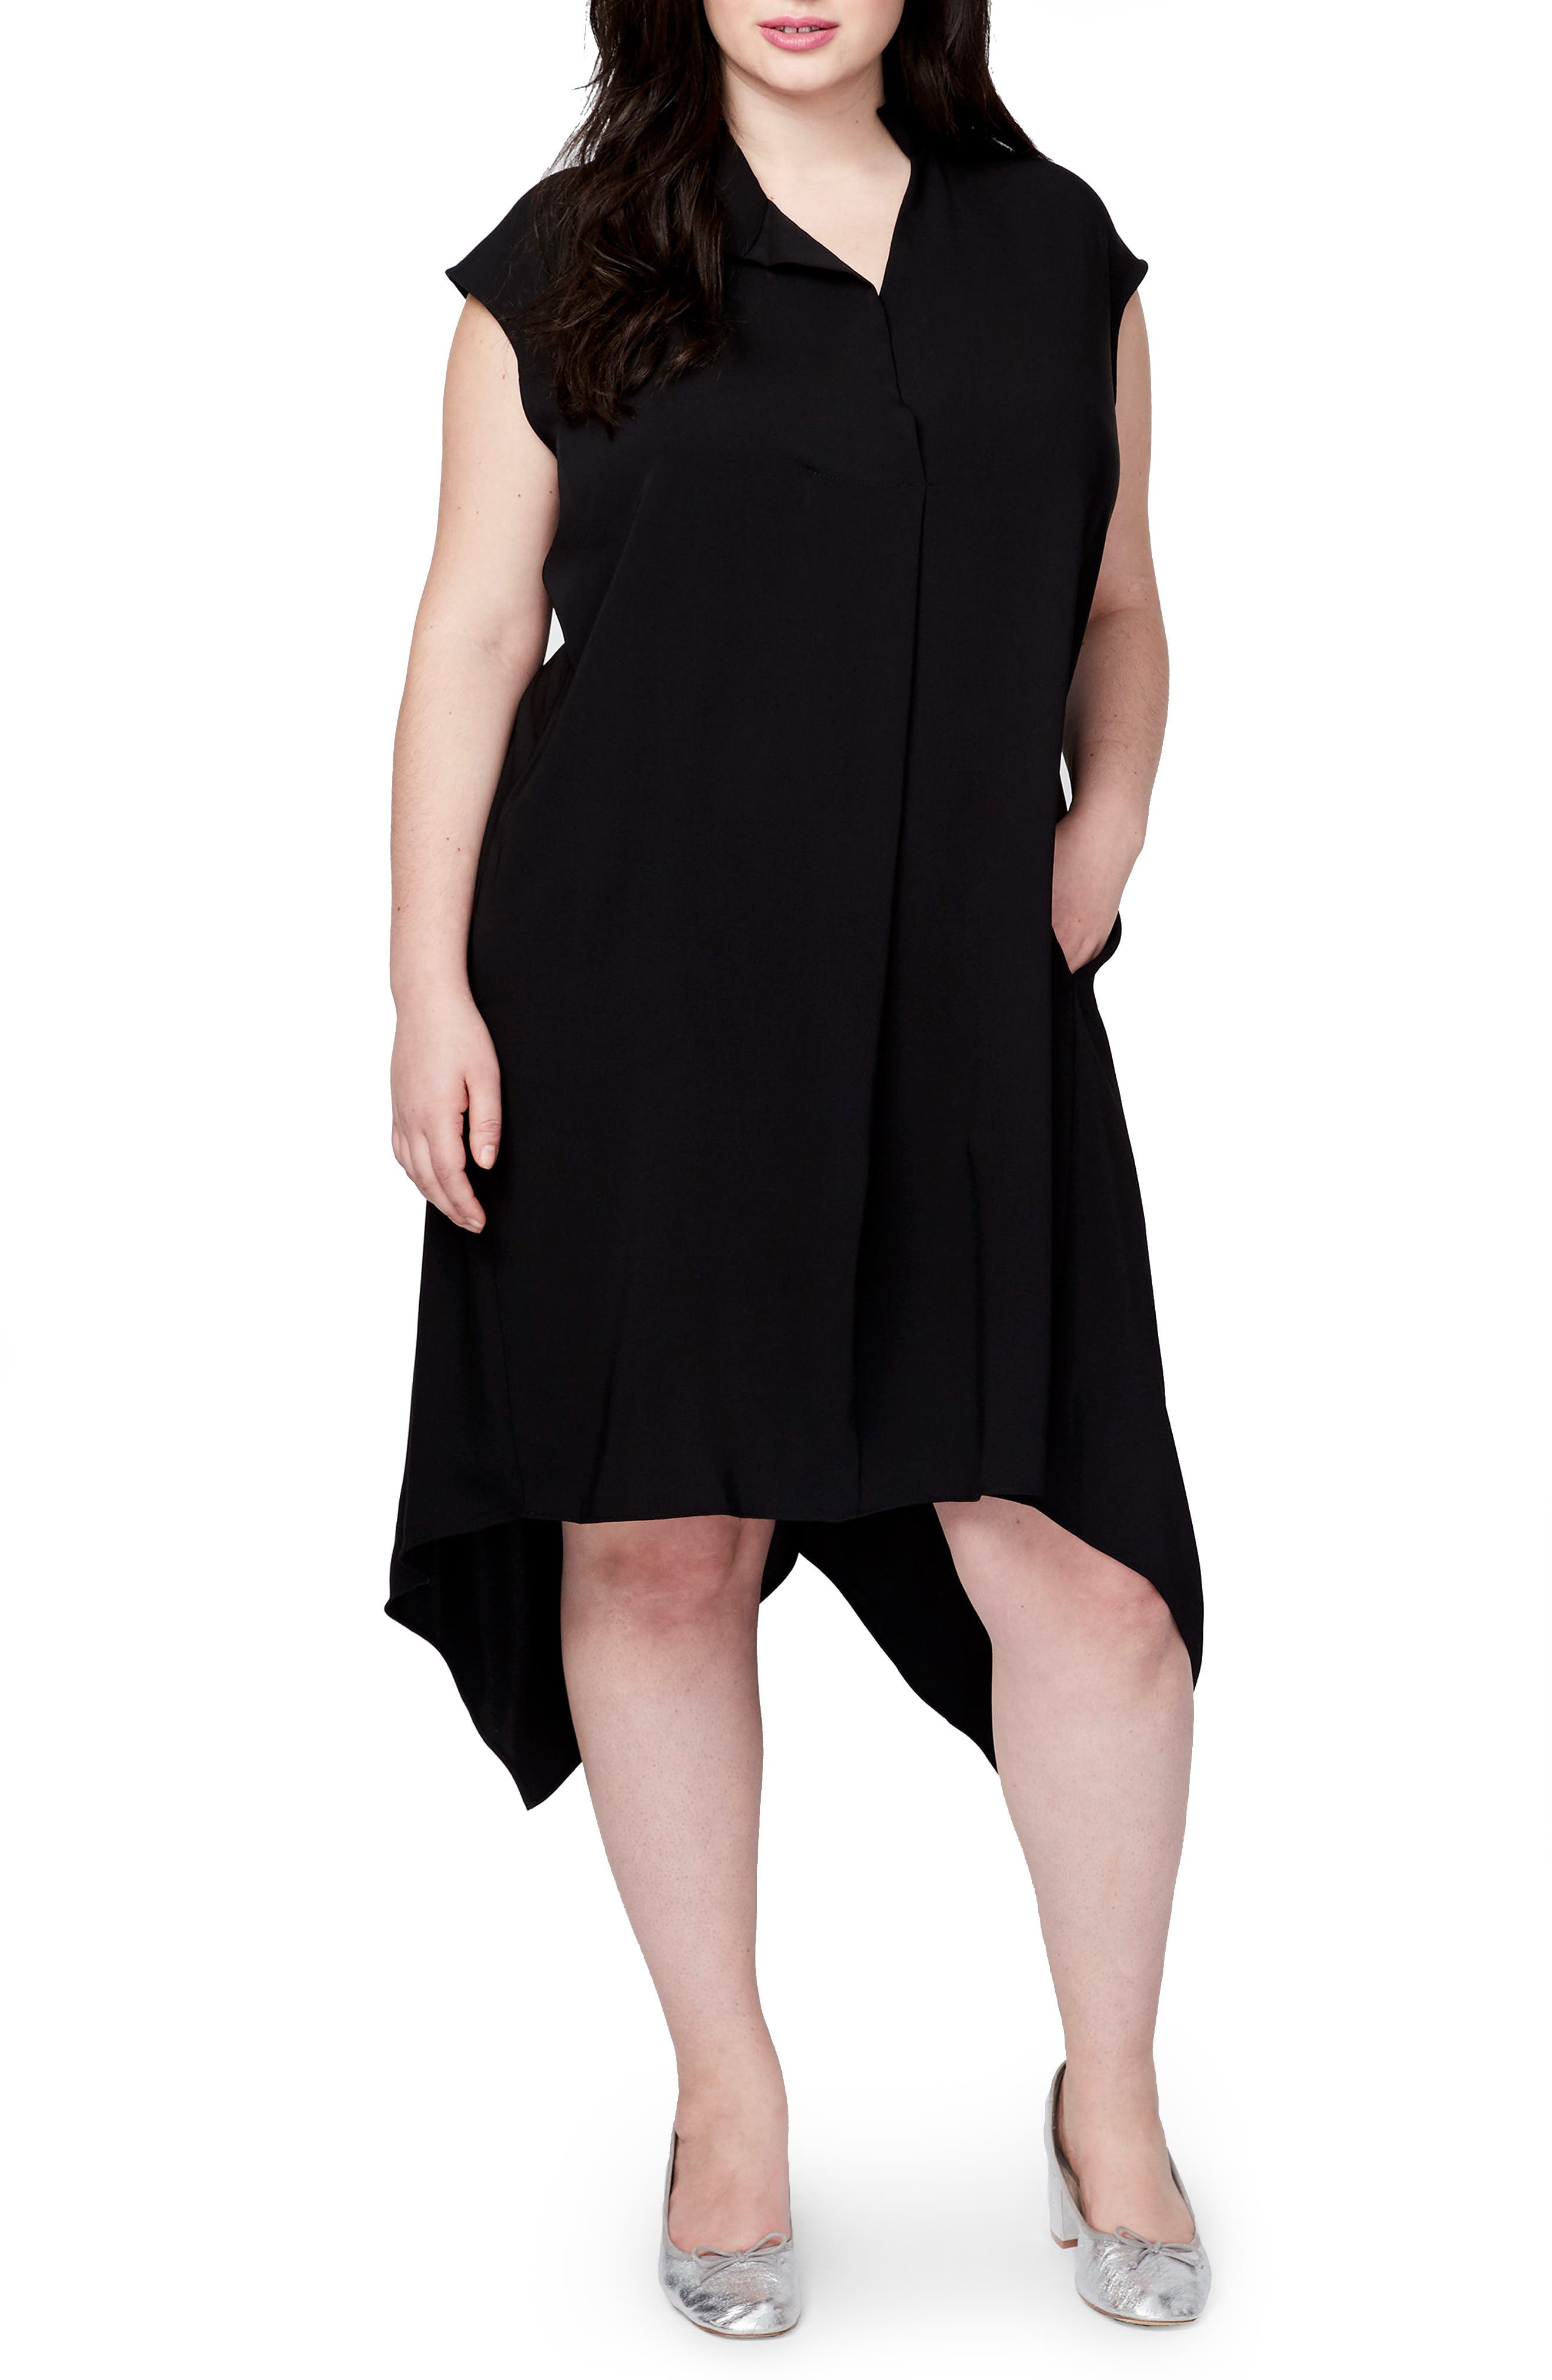 Alternate Image 1 Selected - RACHEL Rachel Roy Harper Handkerchief Hem Dress (Plus Size)